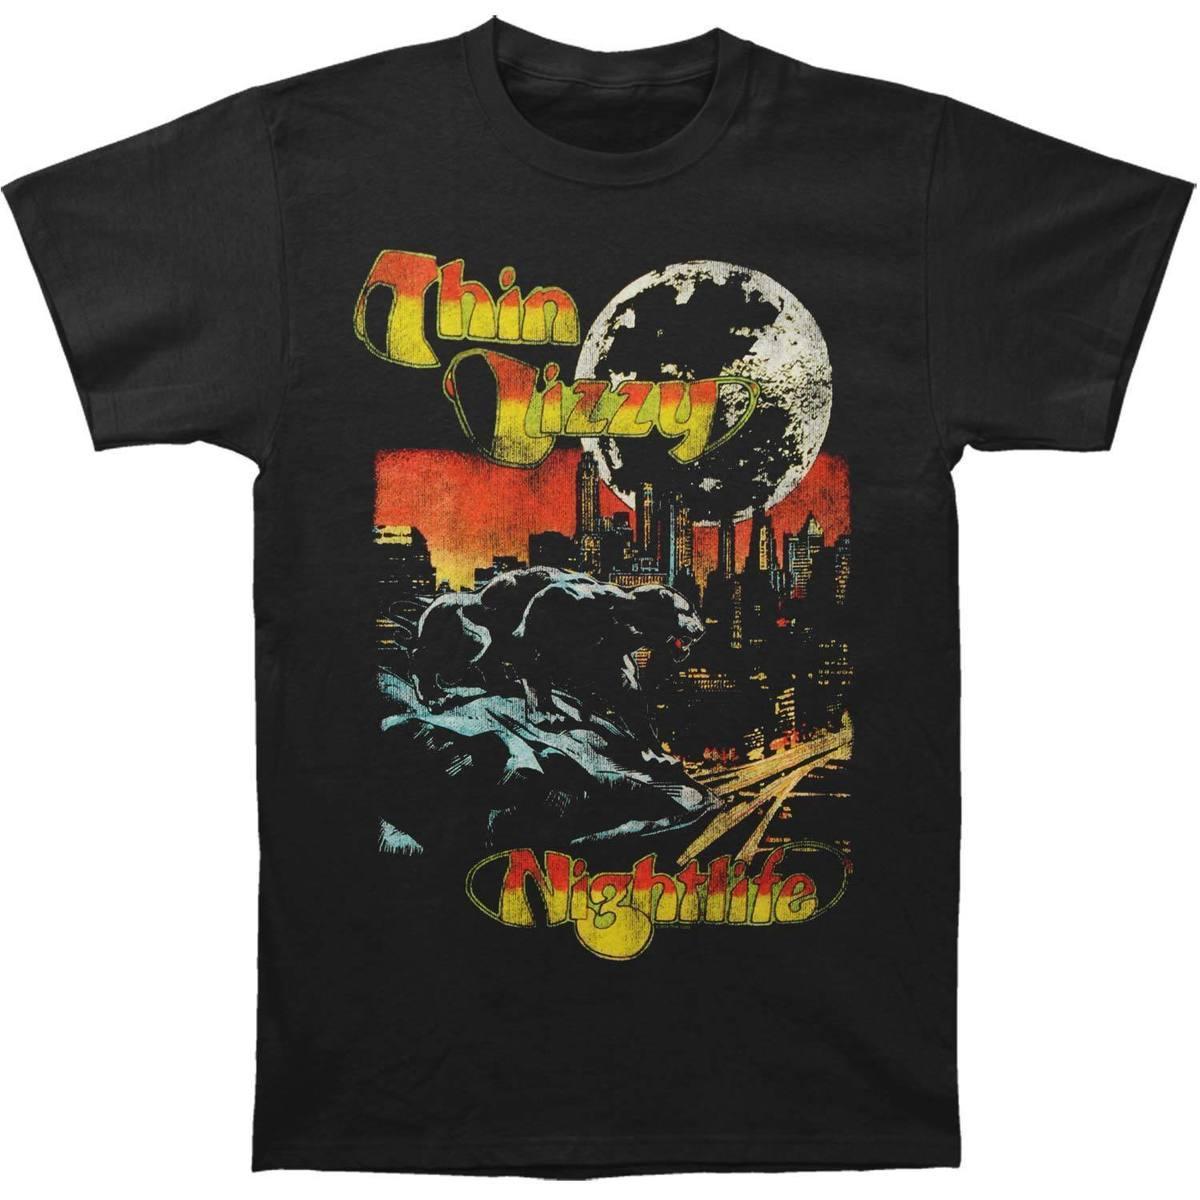 Gary Moore Victims of The Future Music Men/'s Black T-Shirt S M L XL 2XL 3XL